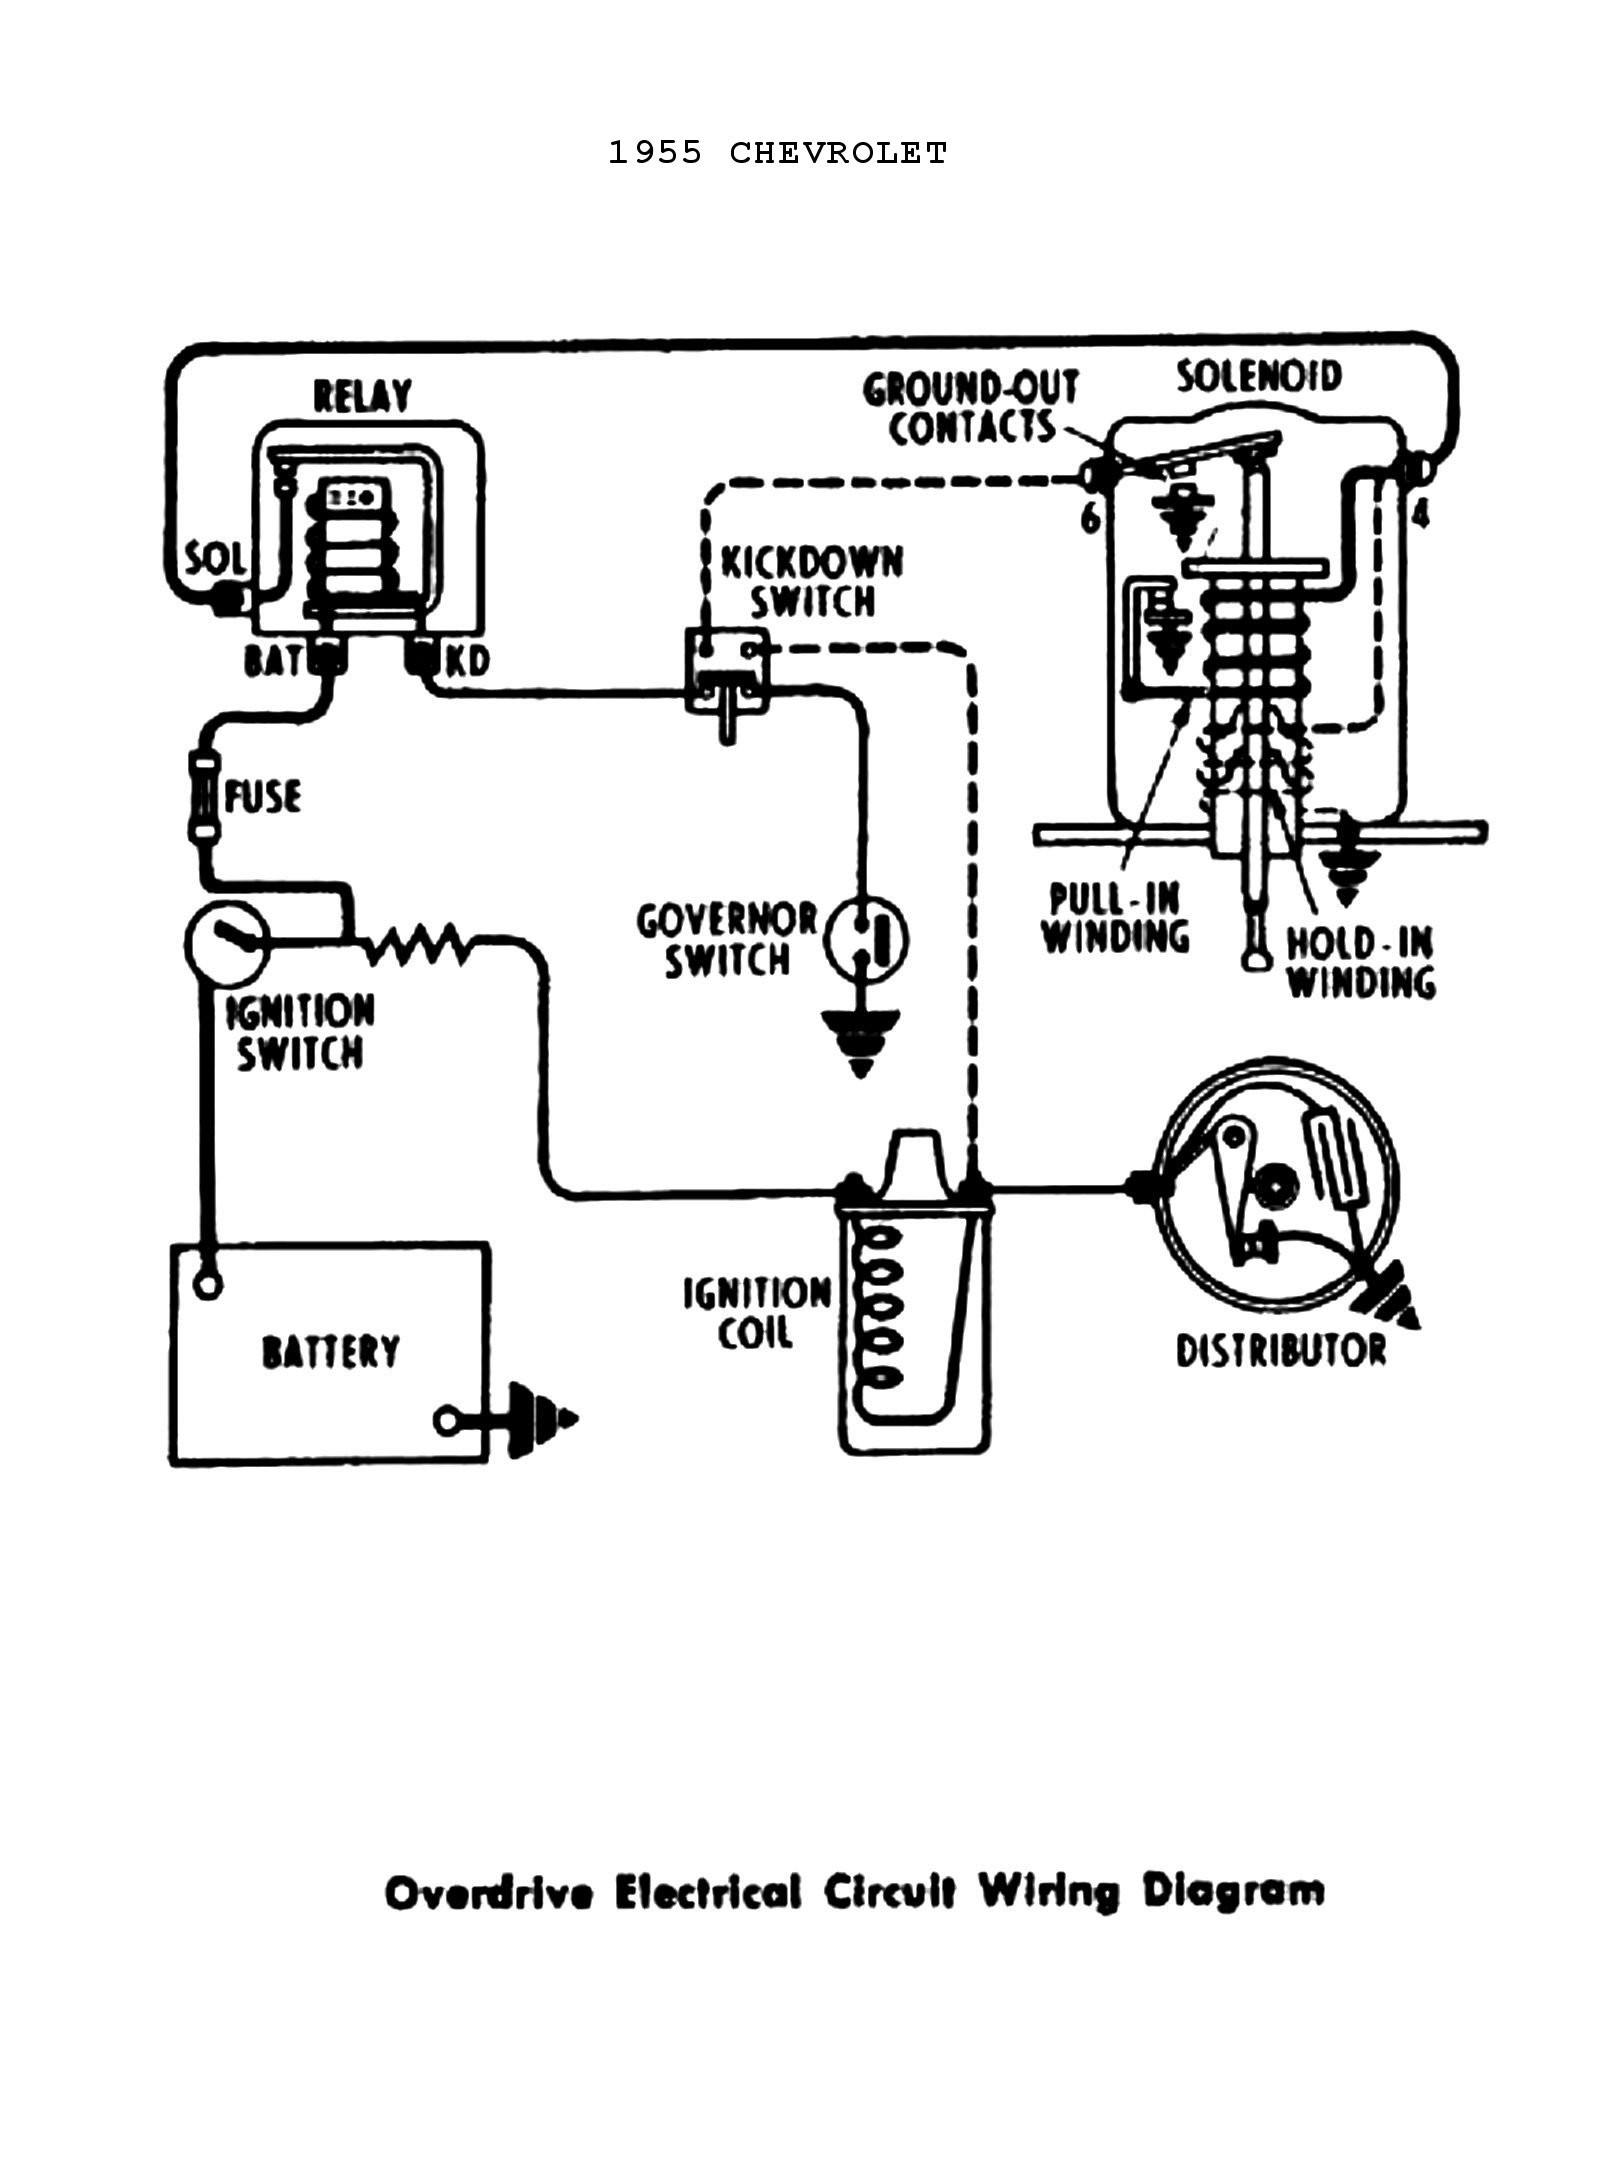 Viper 3305v Wiring Diagram 79ca 6 Volt Positive Ground Voltage Regulator Wiring Diagram Of Viper 3305v Wiring Diagram